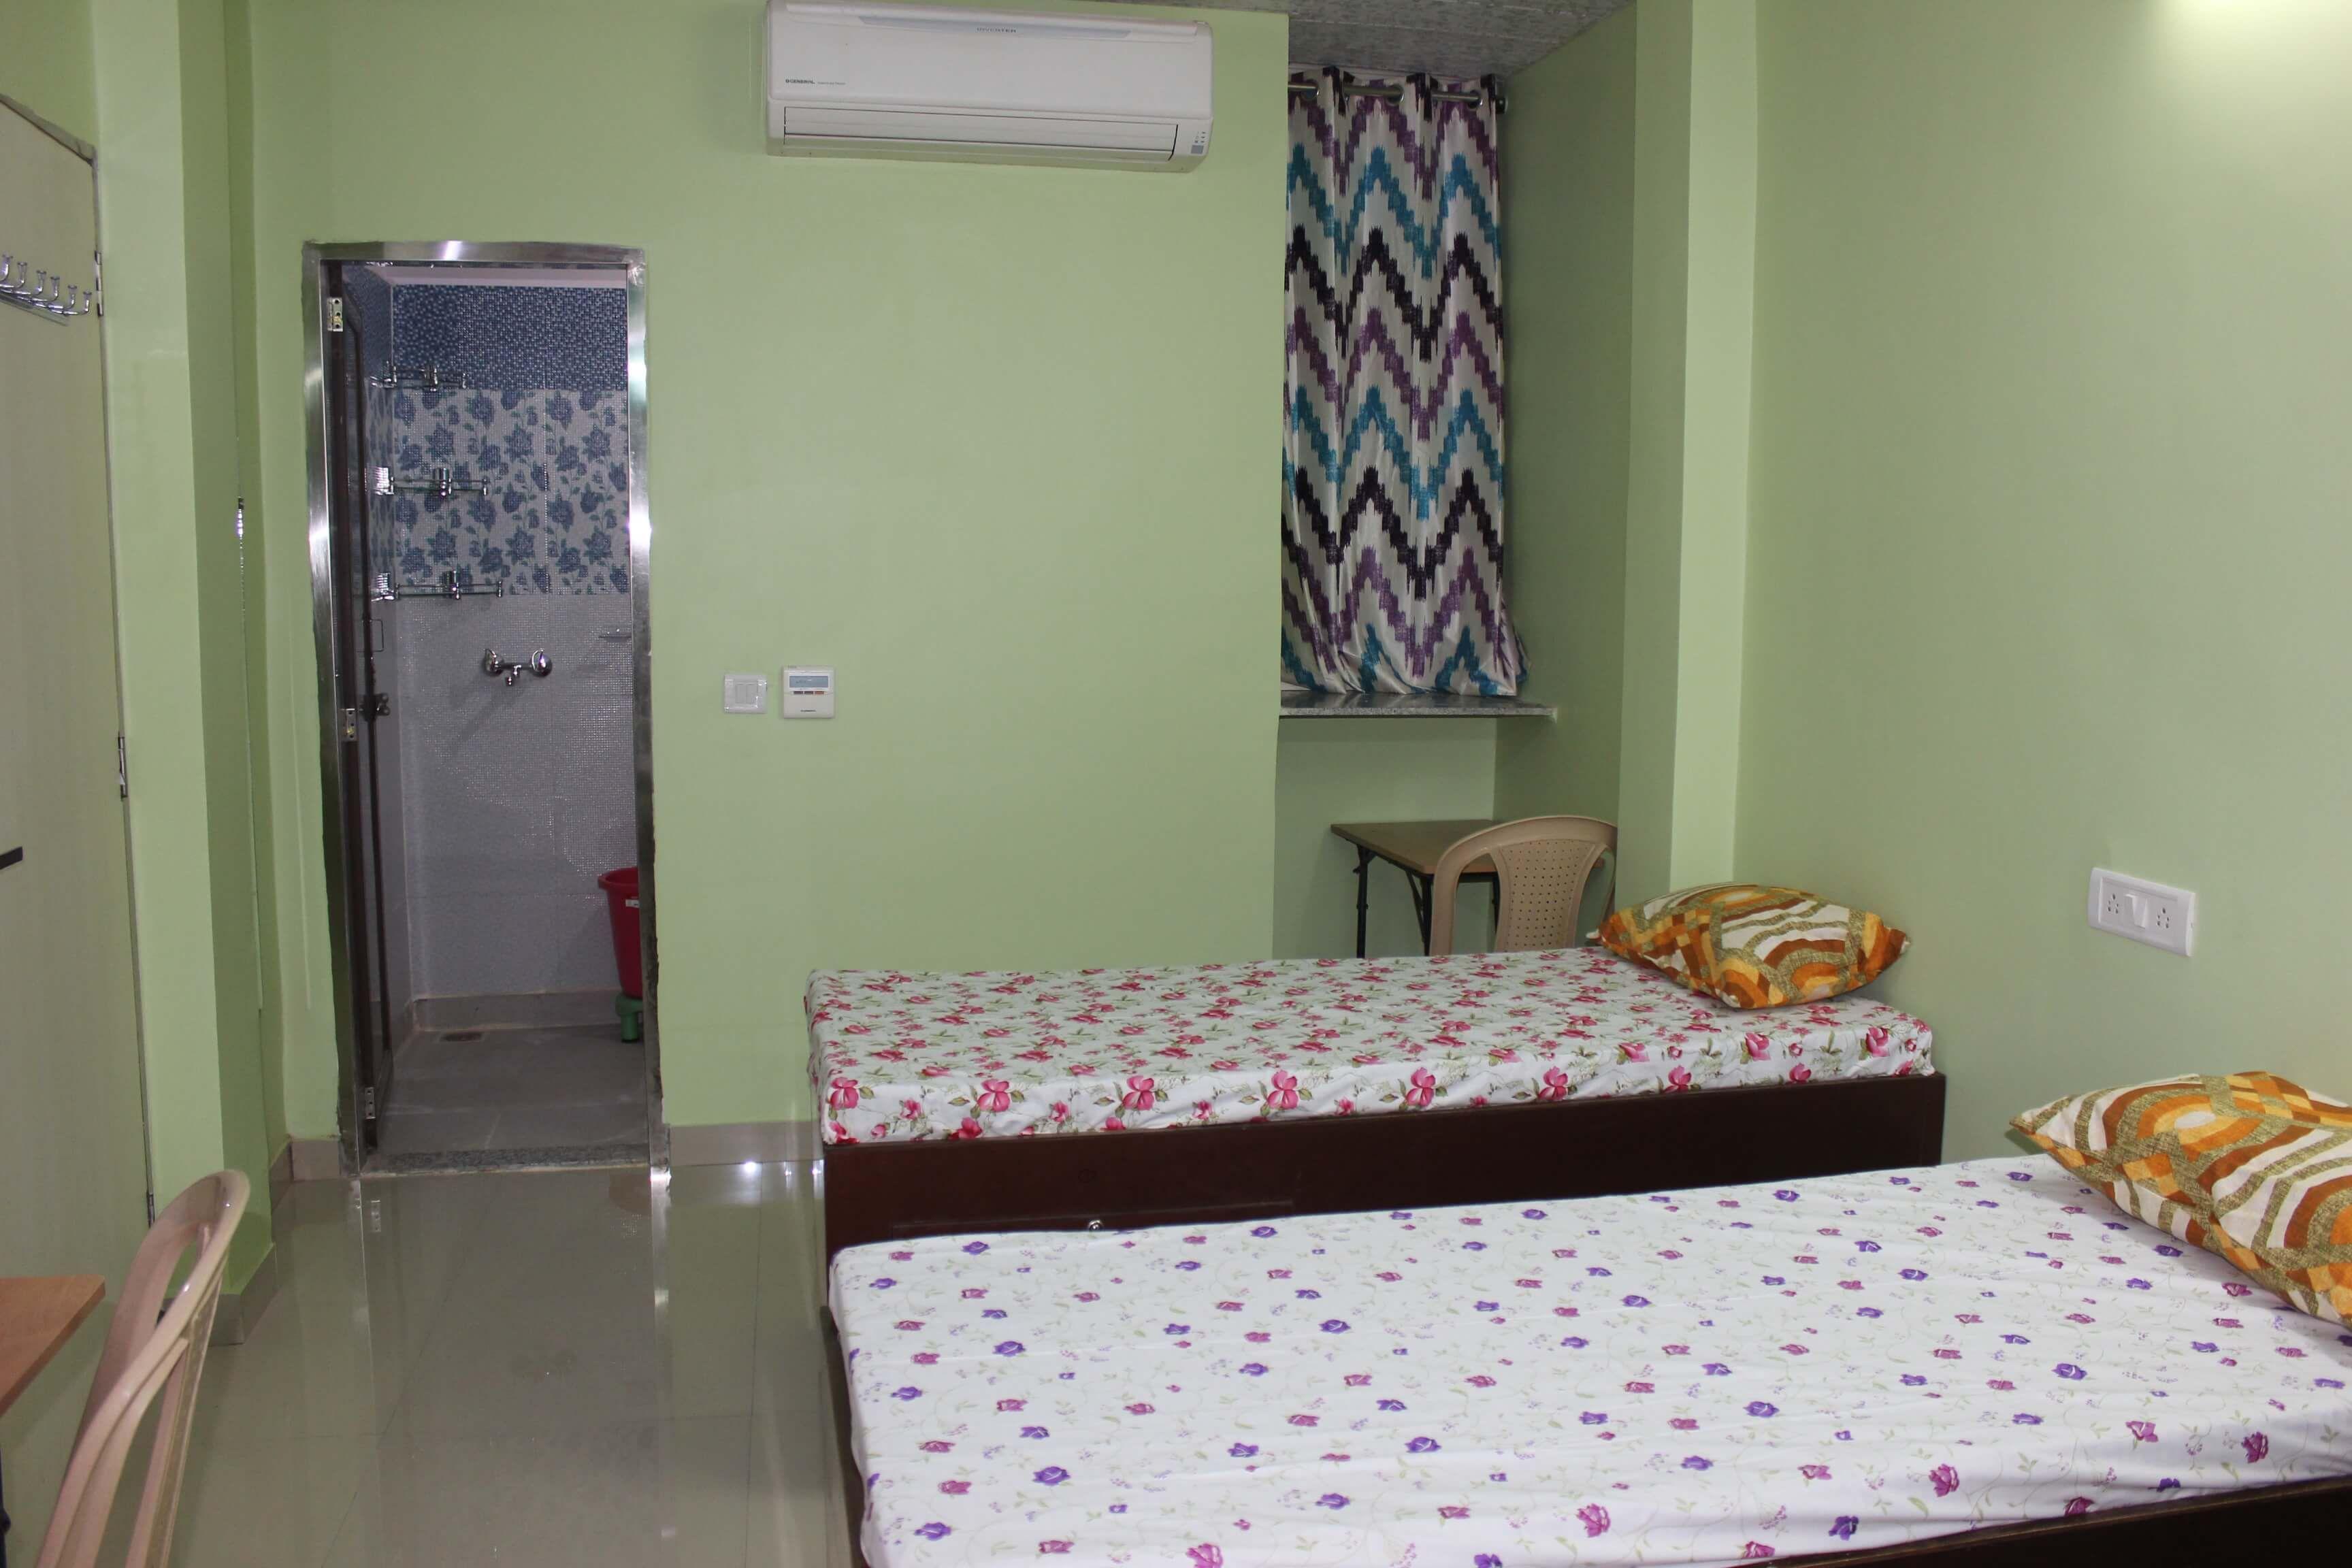 Shreedurgapg For Girls Provide Roomonrent In Delhi With All Basic Facilities We Provide Acroom On Rentforgirls And Rooms For Rent Room Share Accommodation